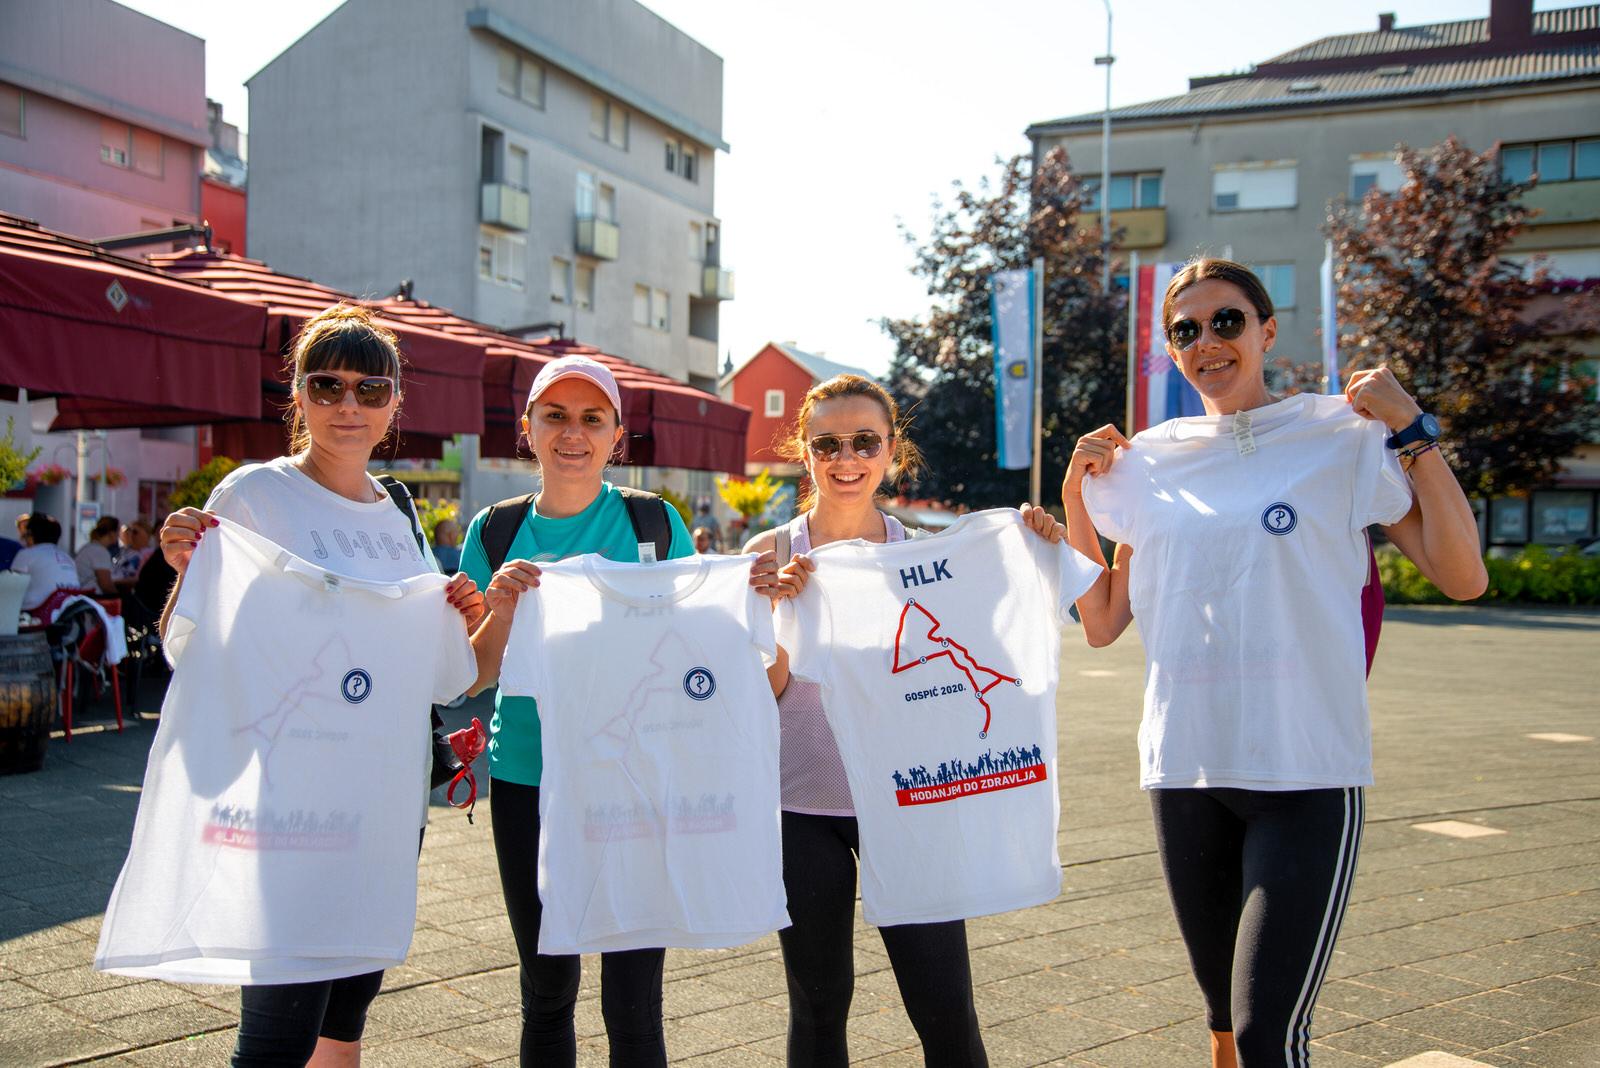 likaclub_gospić_hodanjem do zdravlja 2020 (7)